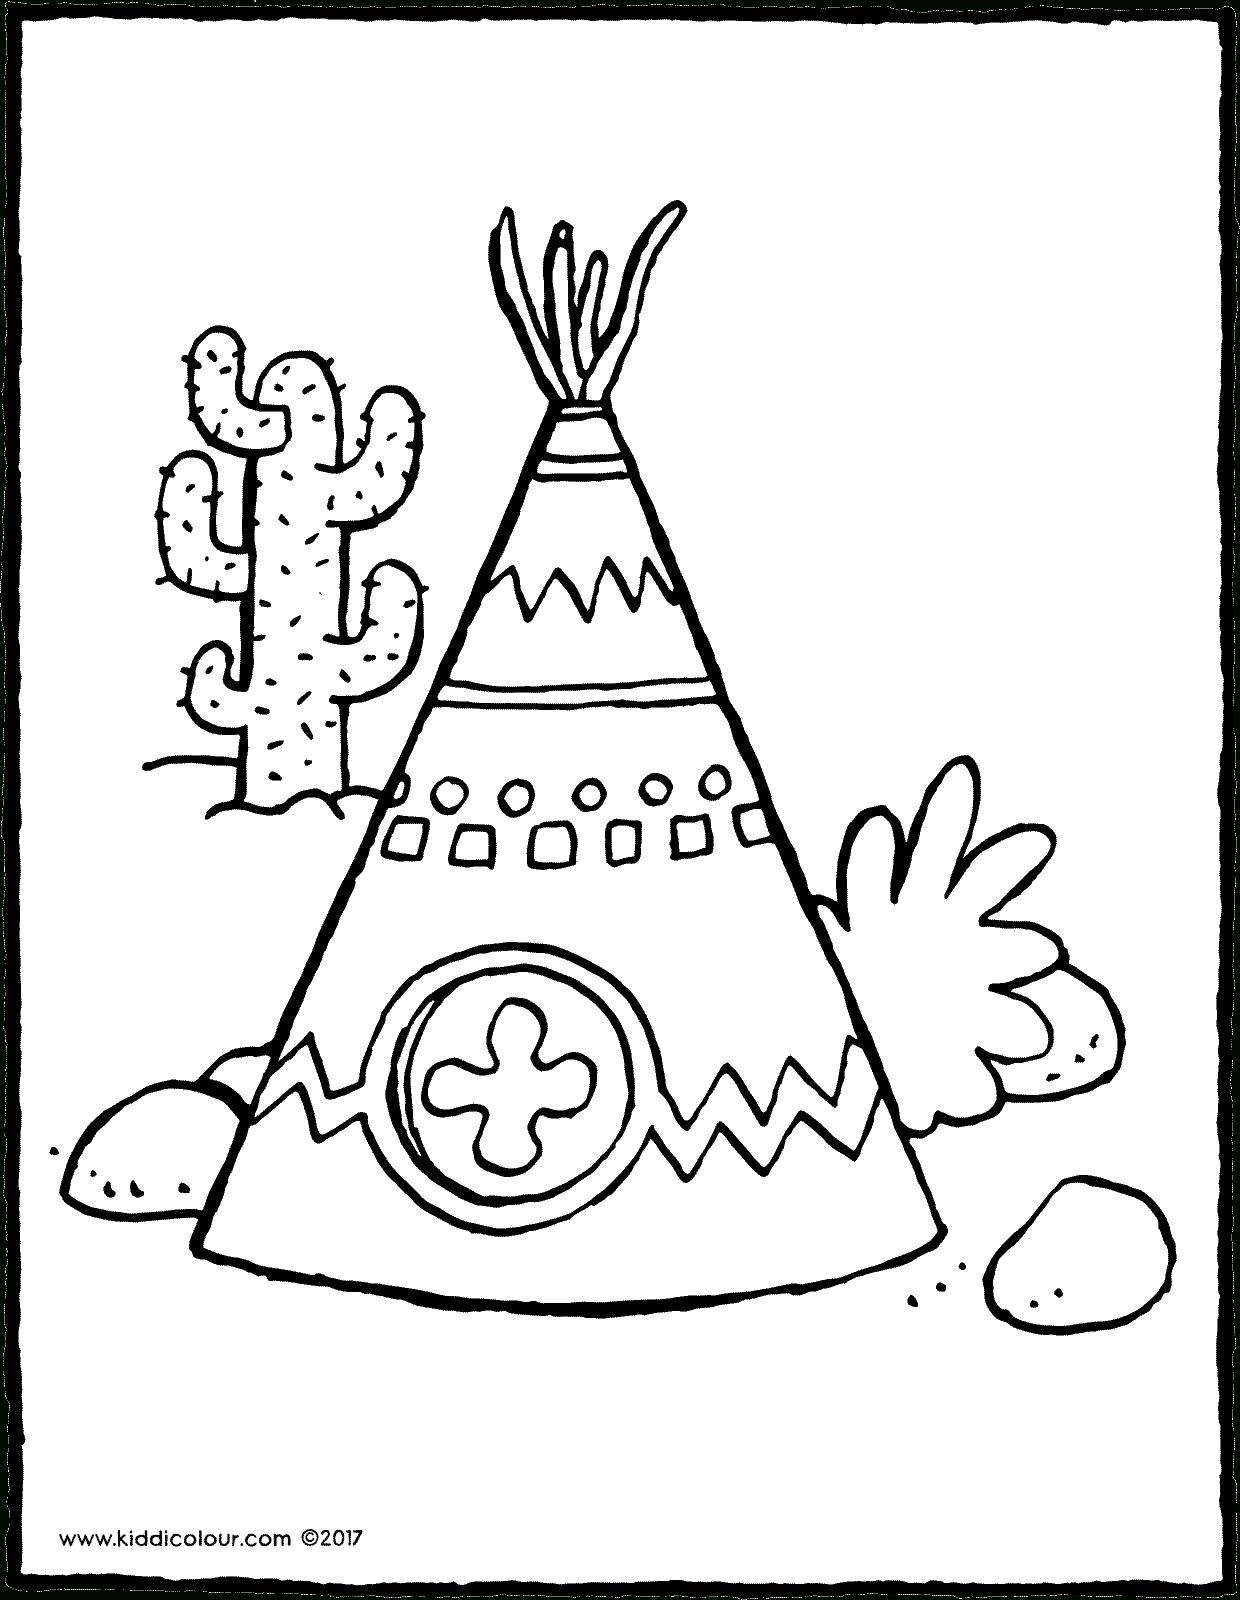 Indianentent - Kiddicolour pour Tipi Dessin